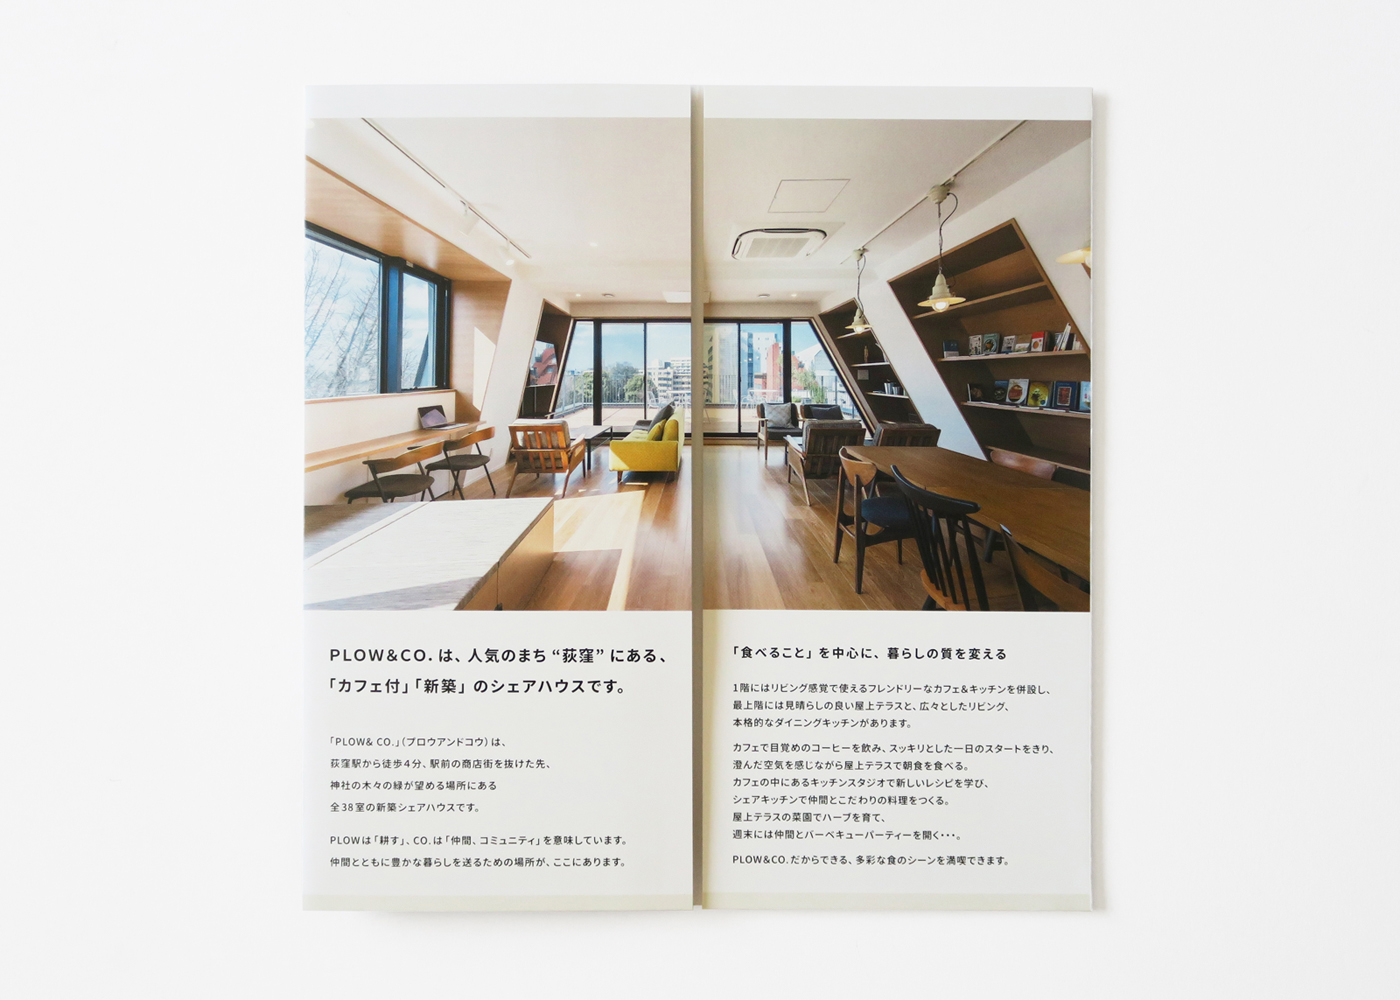 PLOW & CO.导视设计,标识设计 © Hiroko Sakai